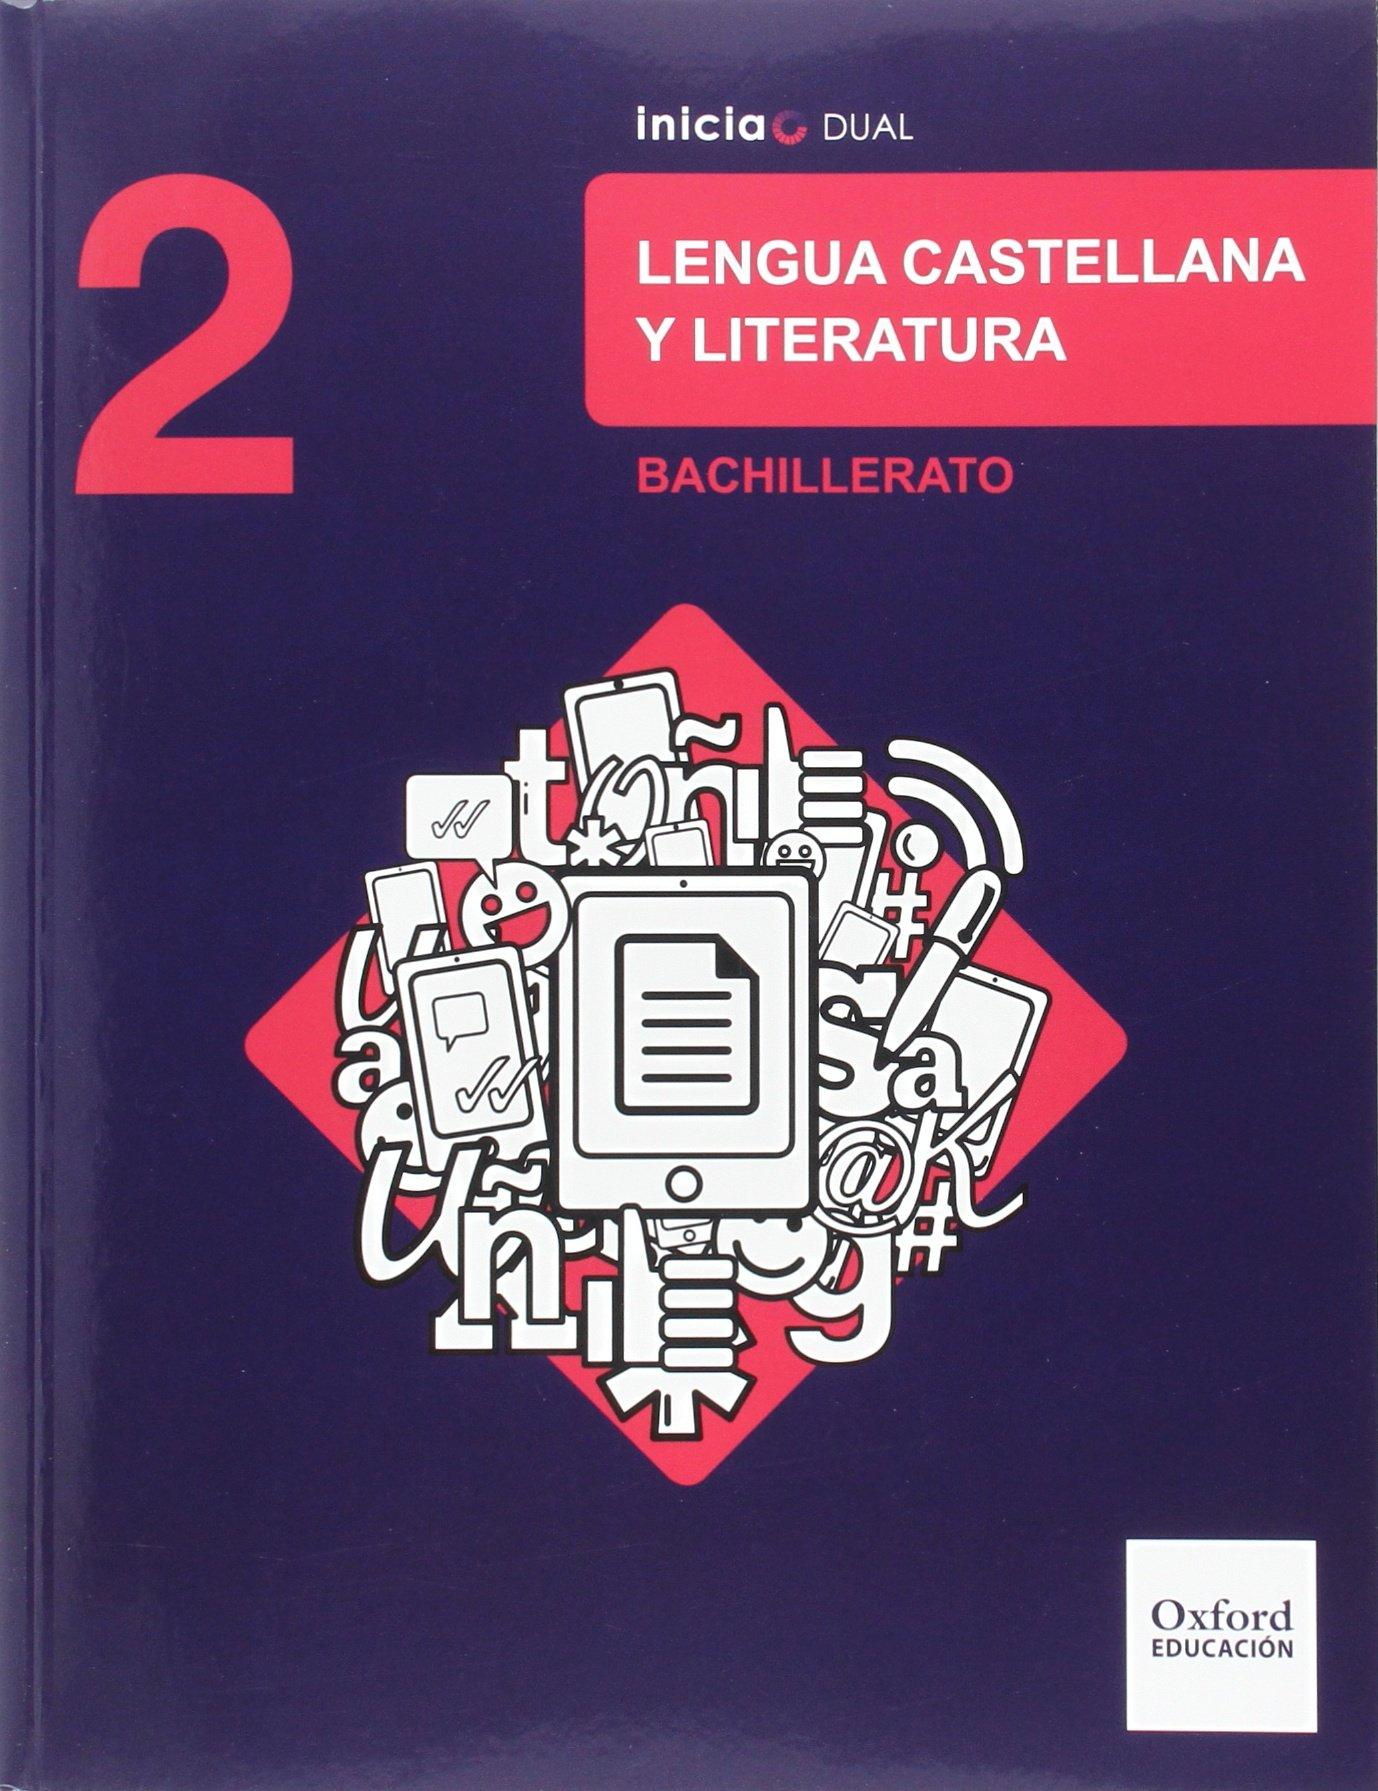 Solucionario Lengua y Literatura 2 Bachillerato Oxford